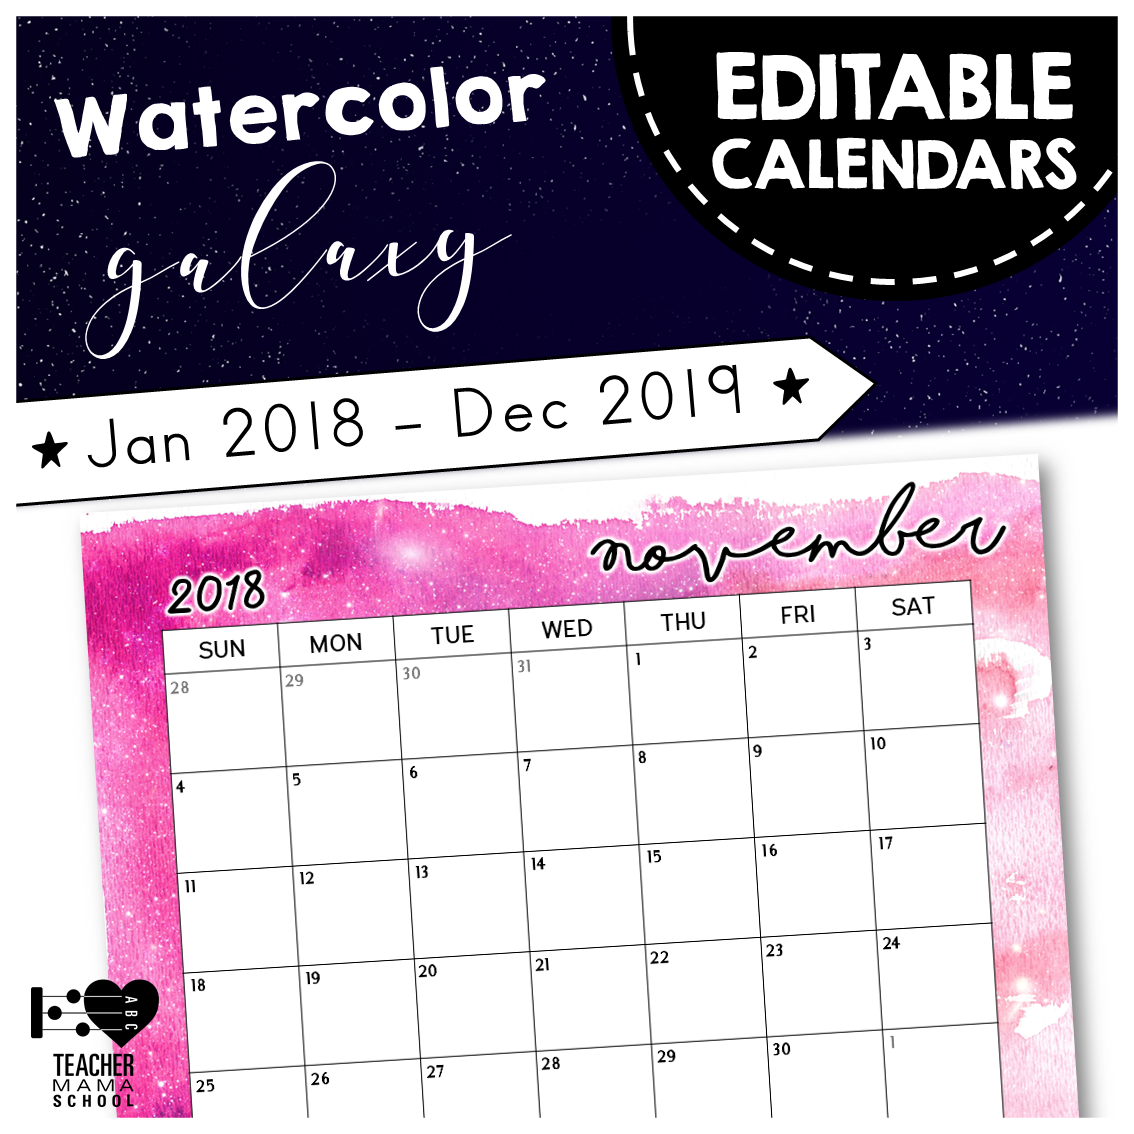 Editable Calendars   Jan 2020 to Dec 2021 {Space Galaxy Theme